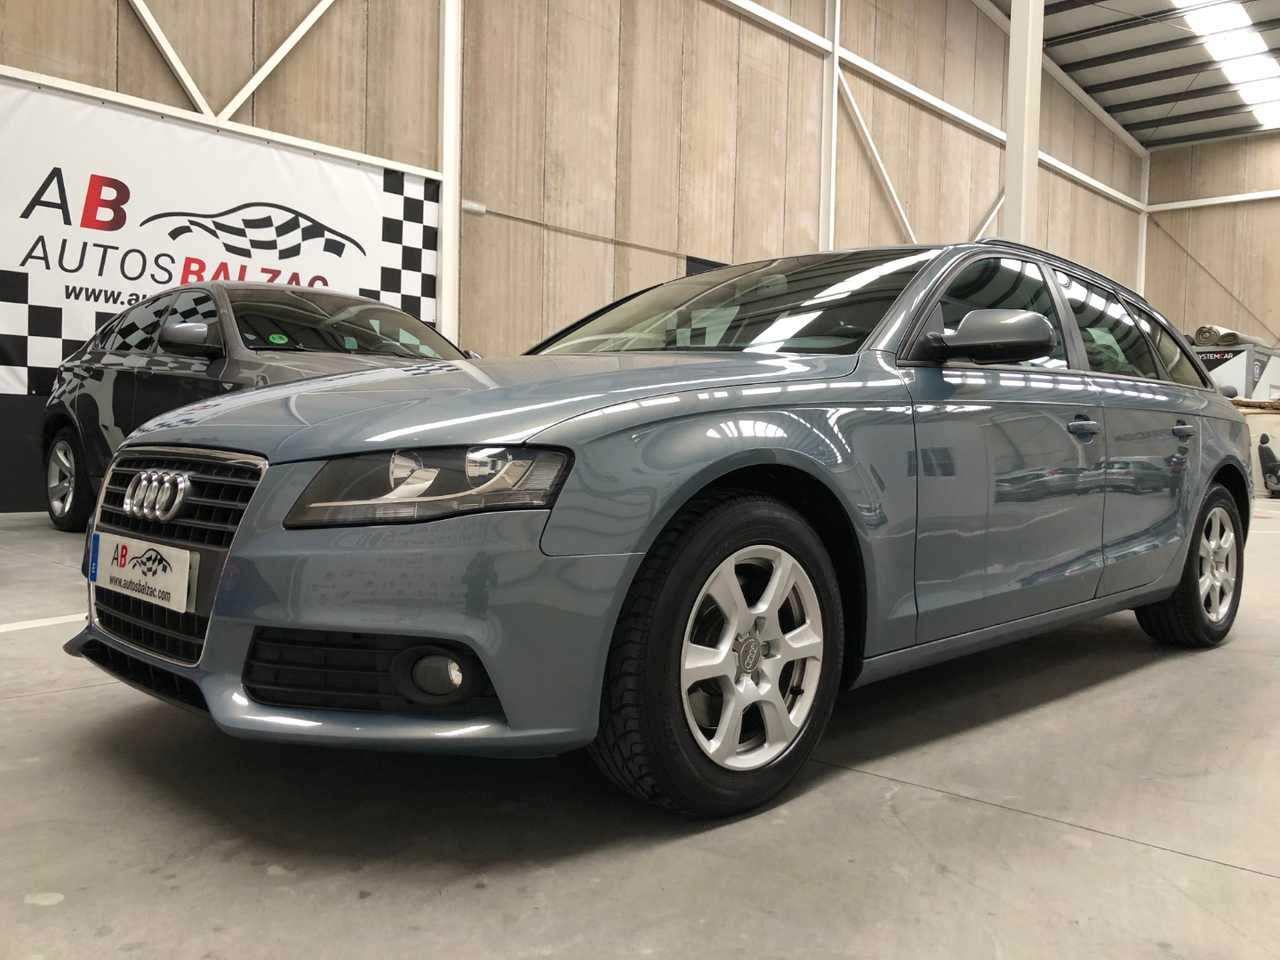 Audi A4 Avant 2.0 TDI 143 DPF Multitronic 8   - Foto 1